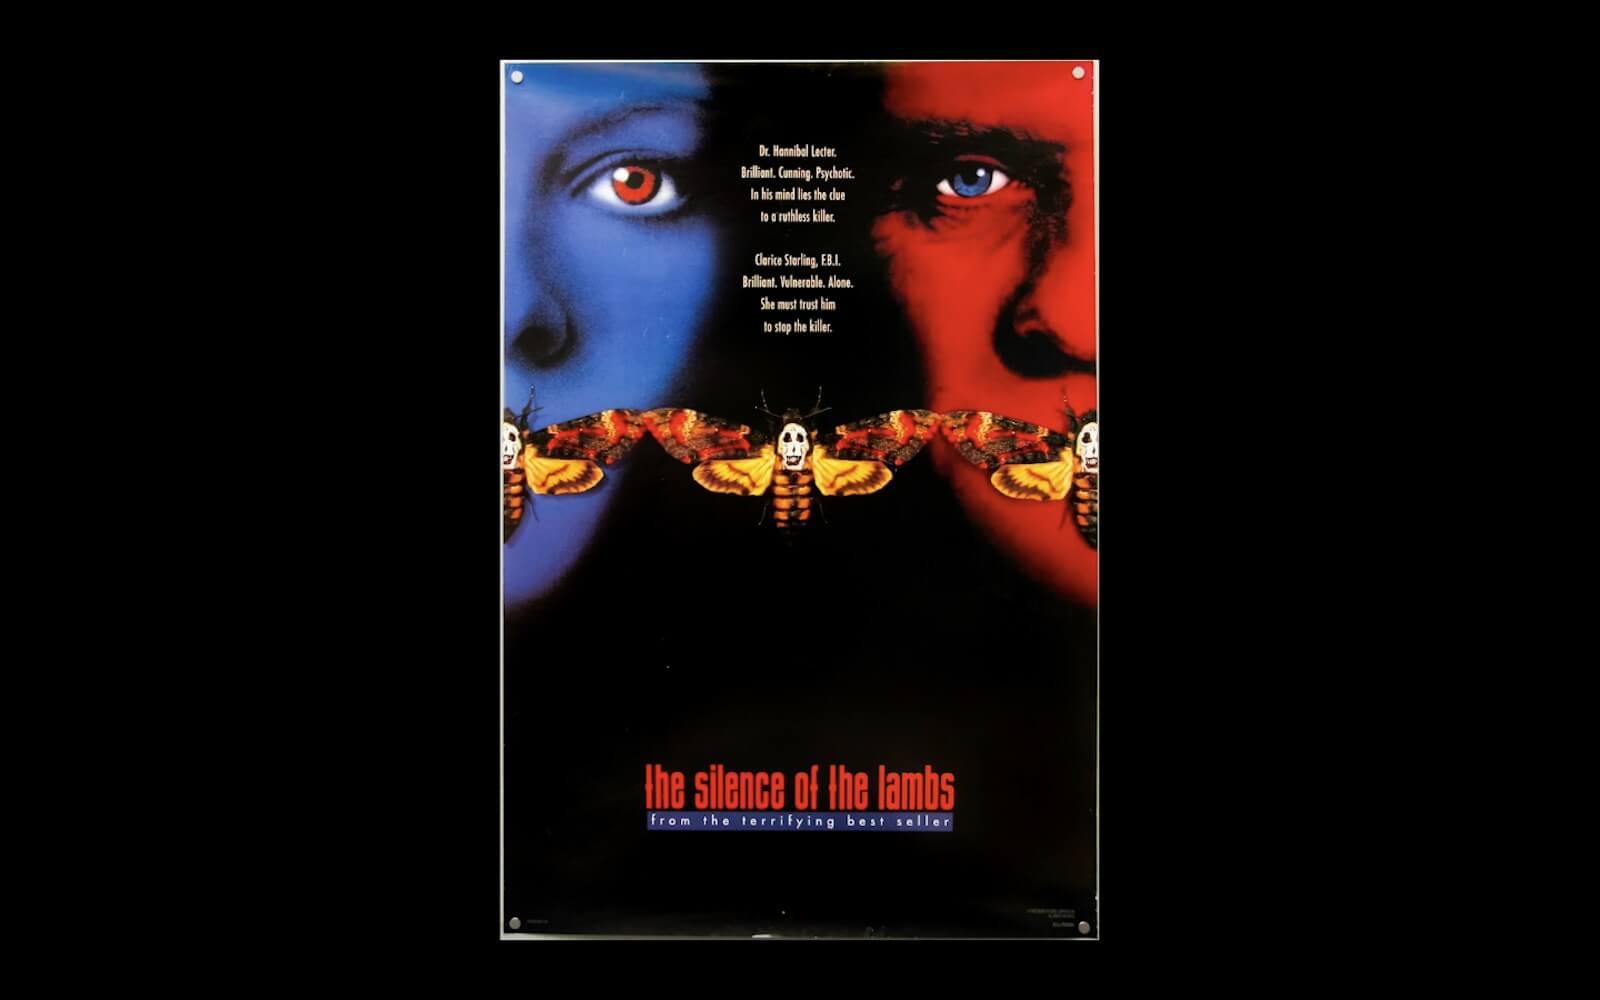 silence-motif-movie-poster